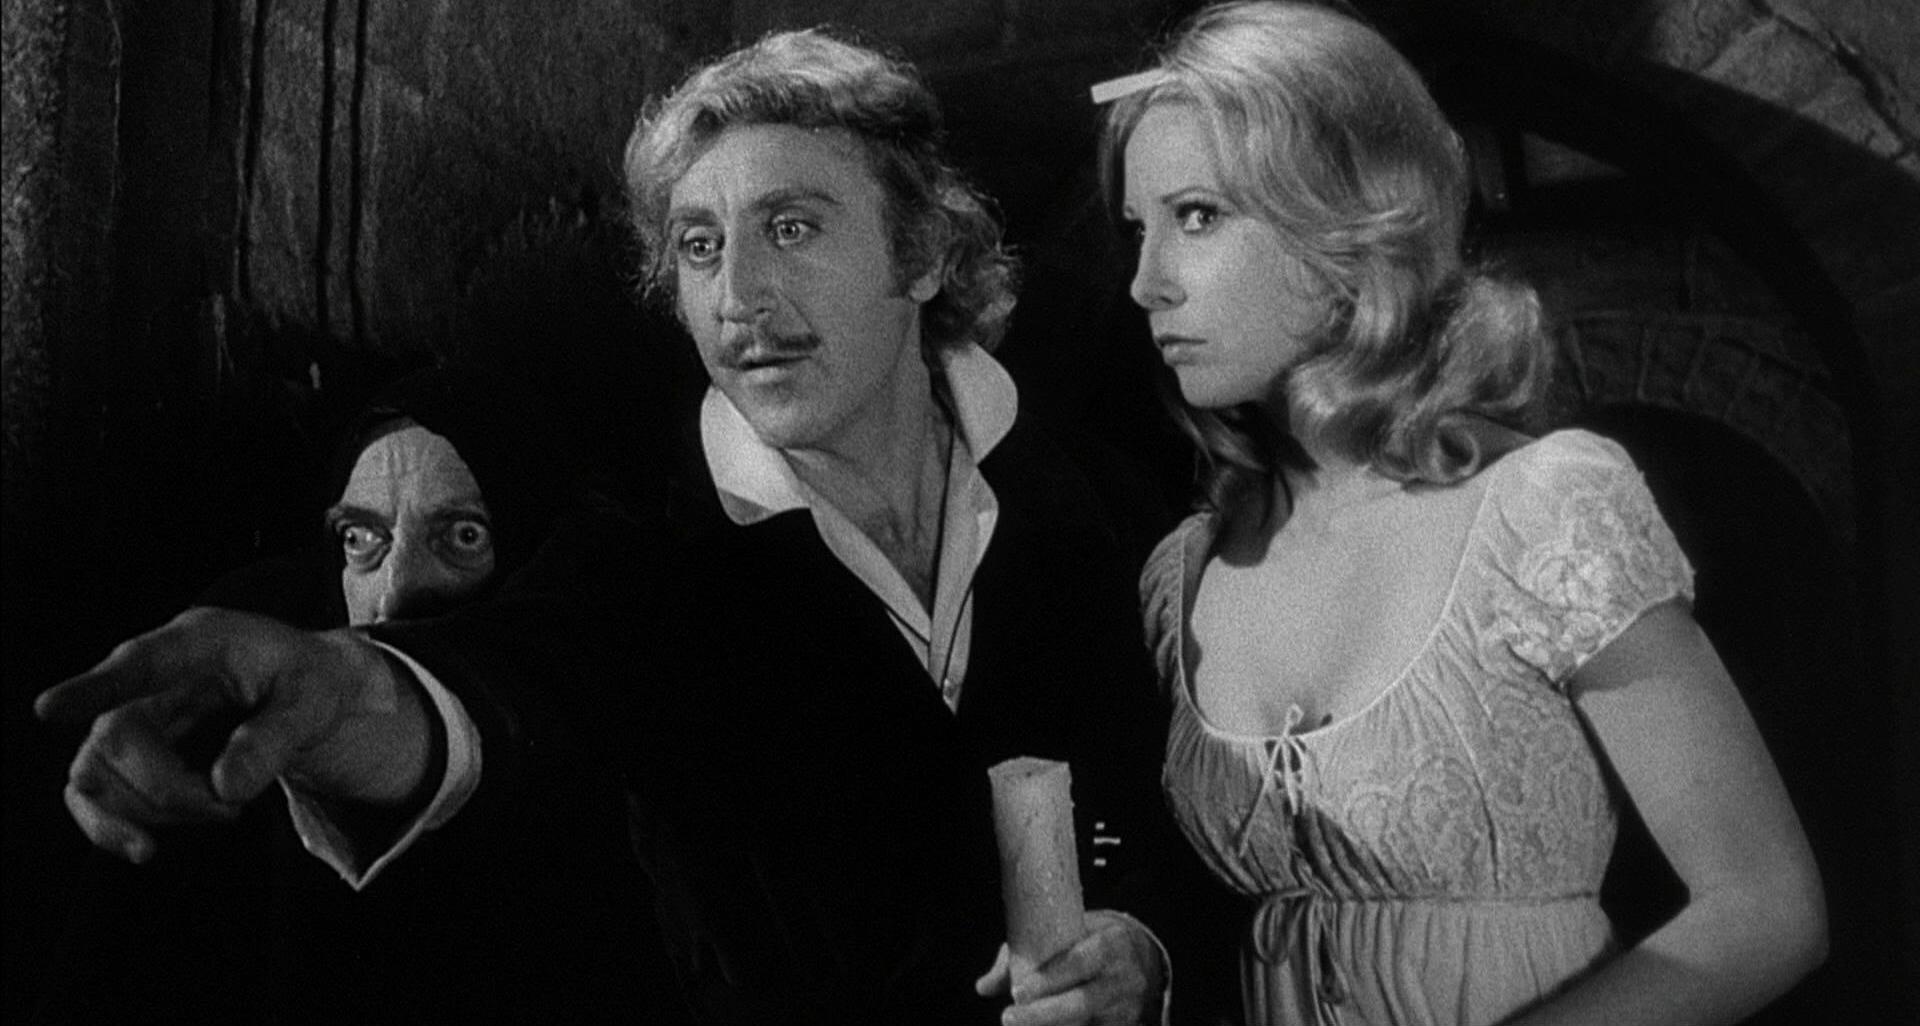 (l to r) Igor (Marty Feldman), Frederick Frankenstein (Gene Wilder) and Inga (Teri Garr) in Young Frankenstein (1974)